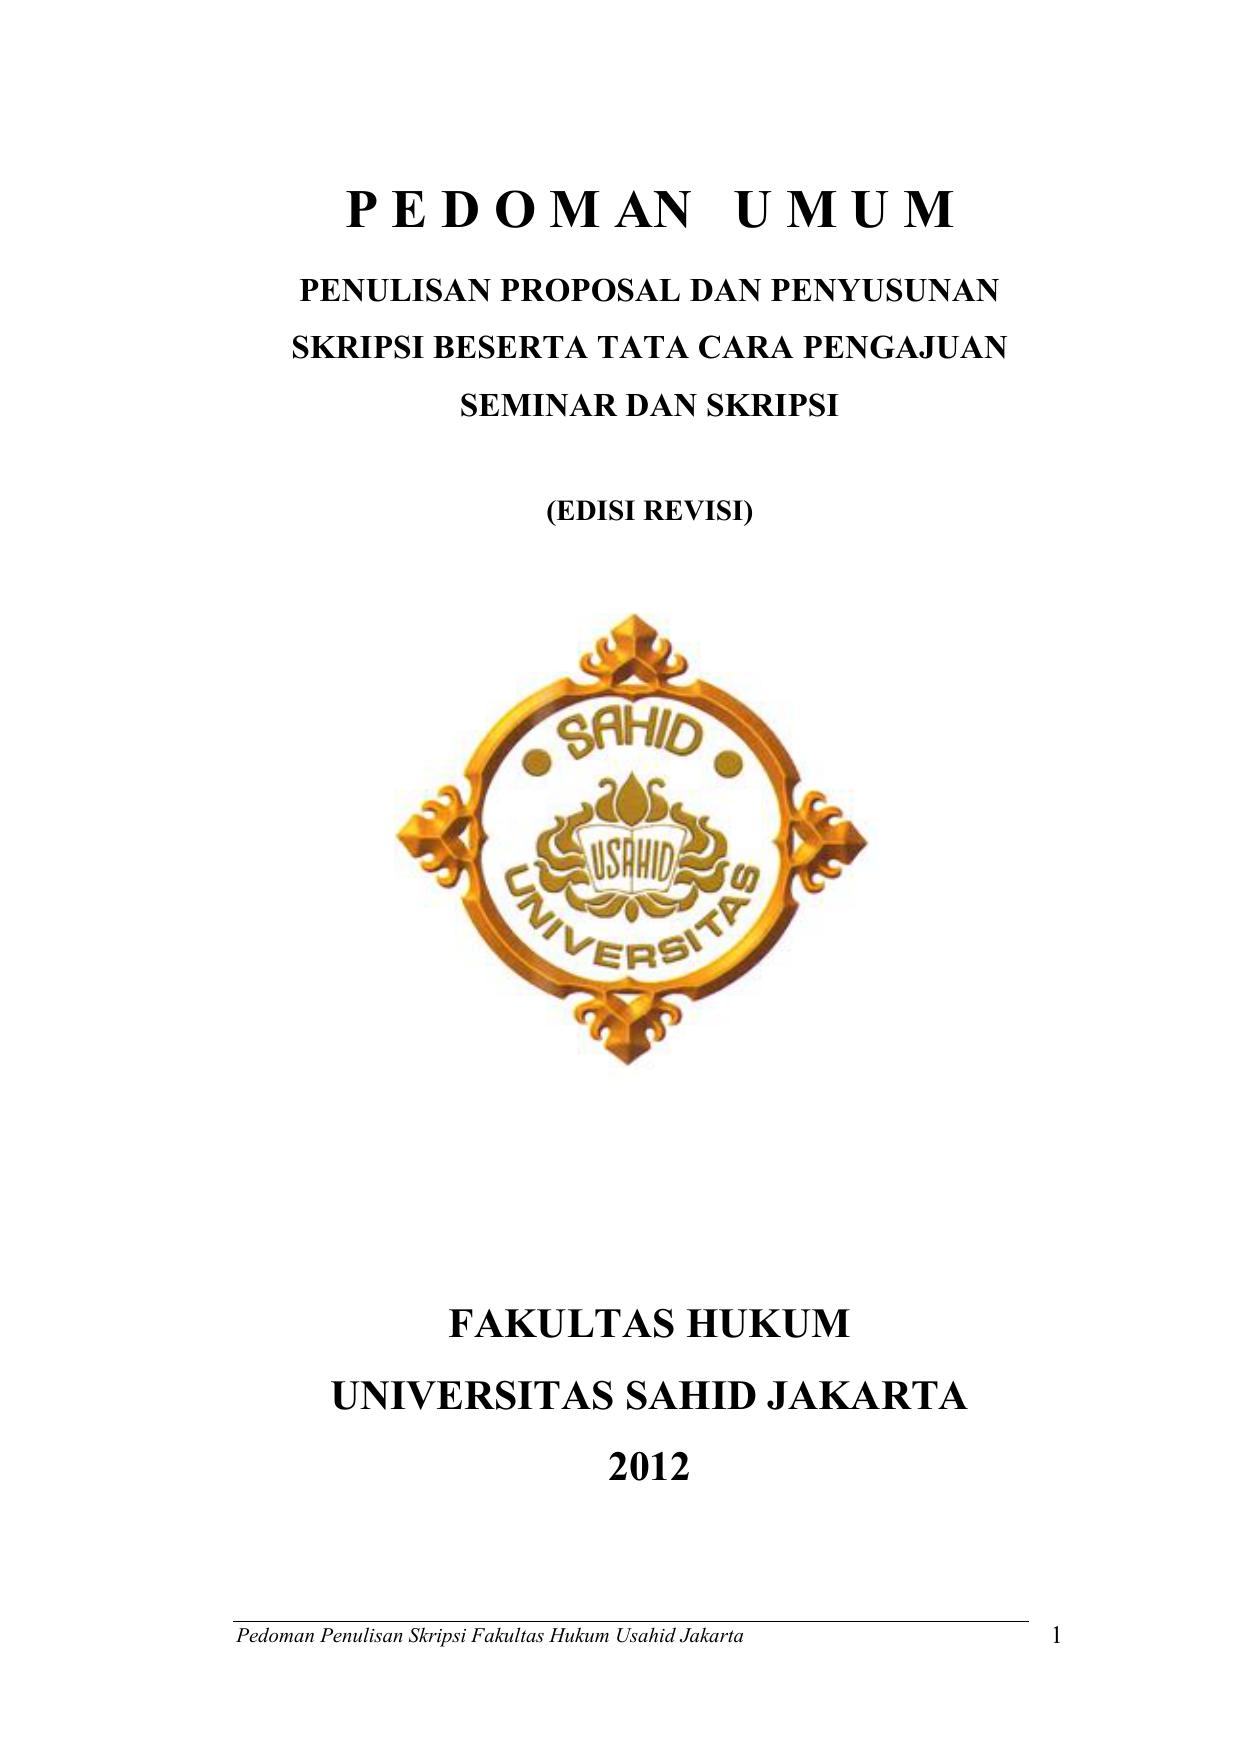 P E D O M An U M U M Universitas Sahid Jakarta